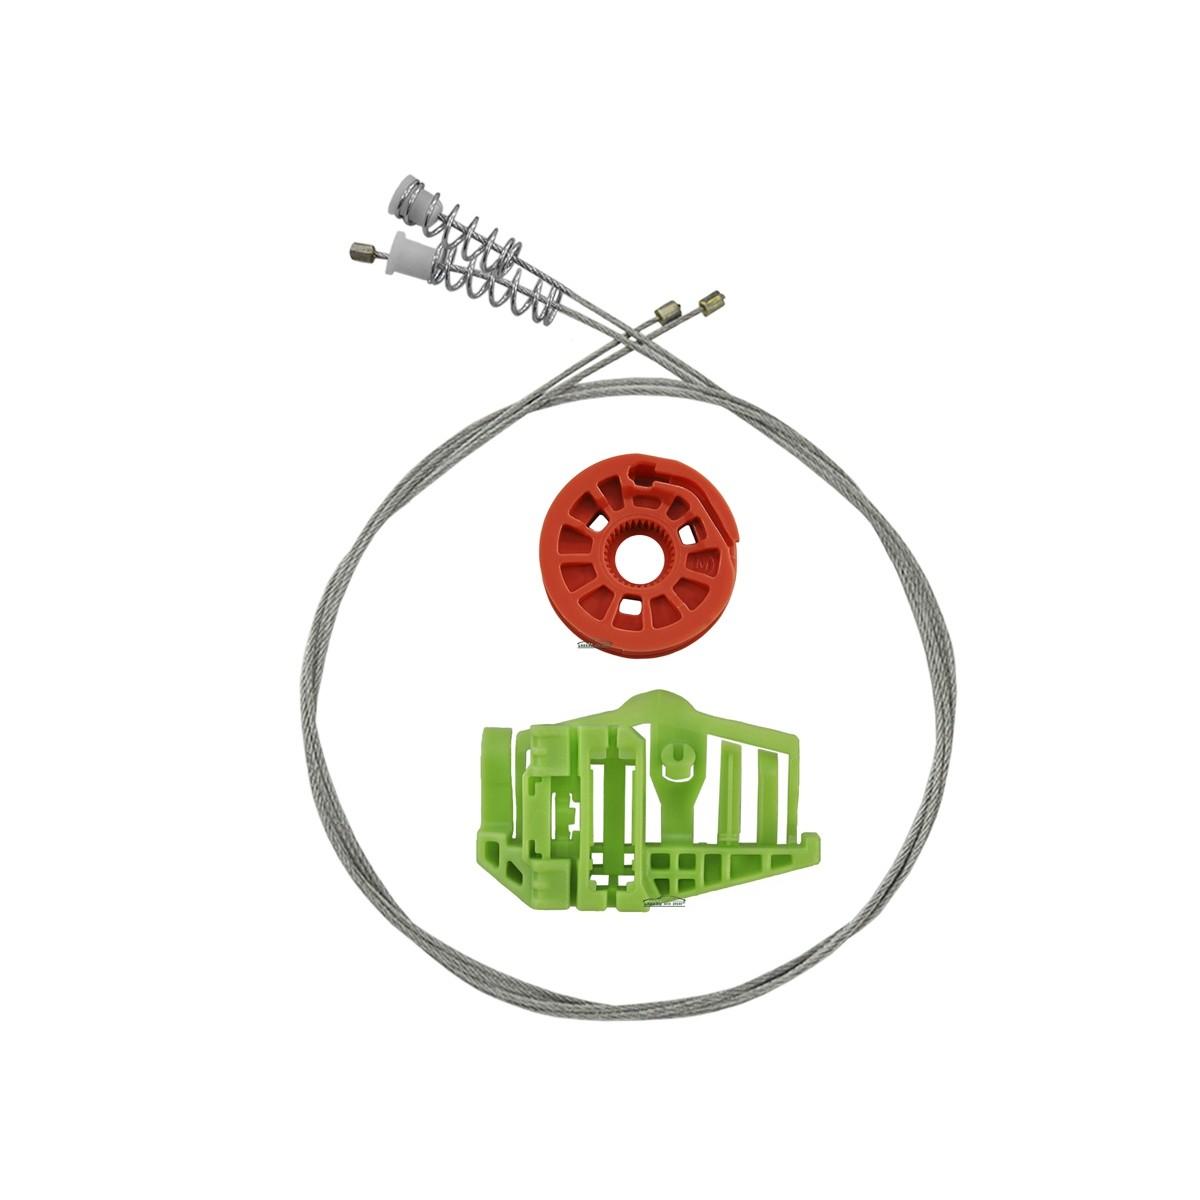 Kit Reparo Máquina de Vidro Elétrico Traseiro Bmw X1  4 Portas Esquerdo